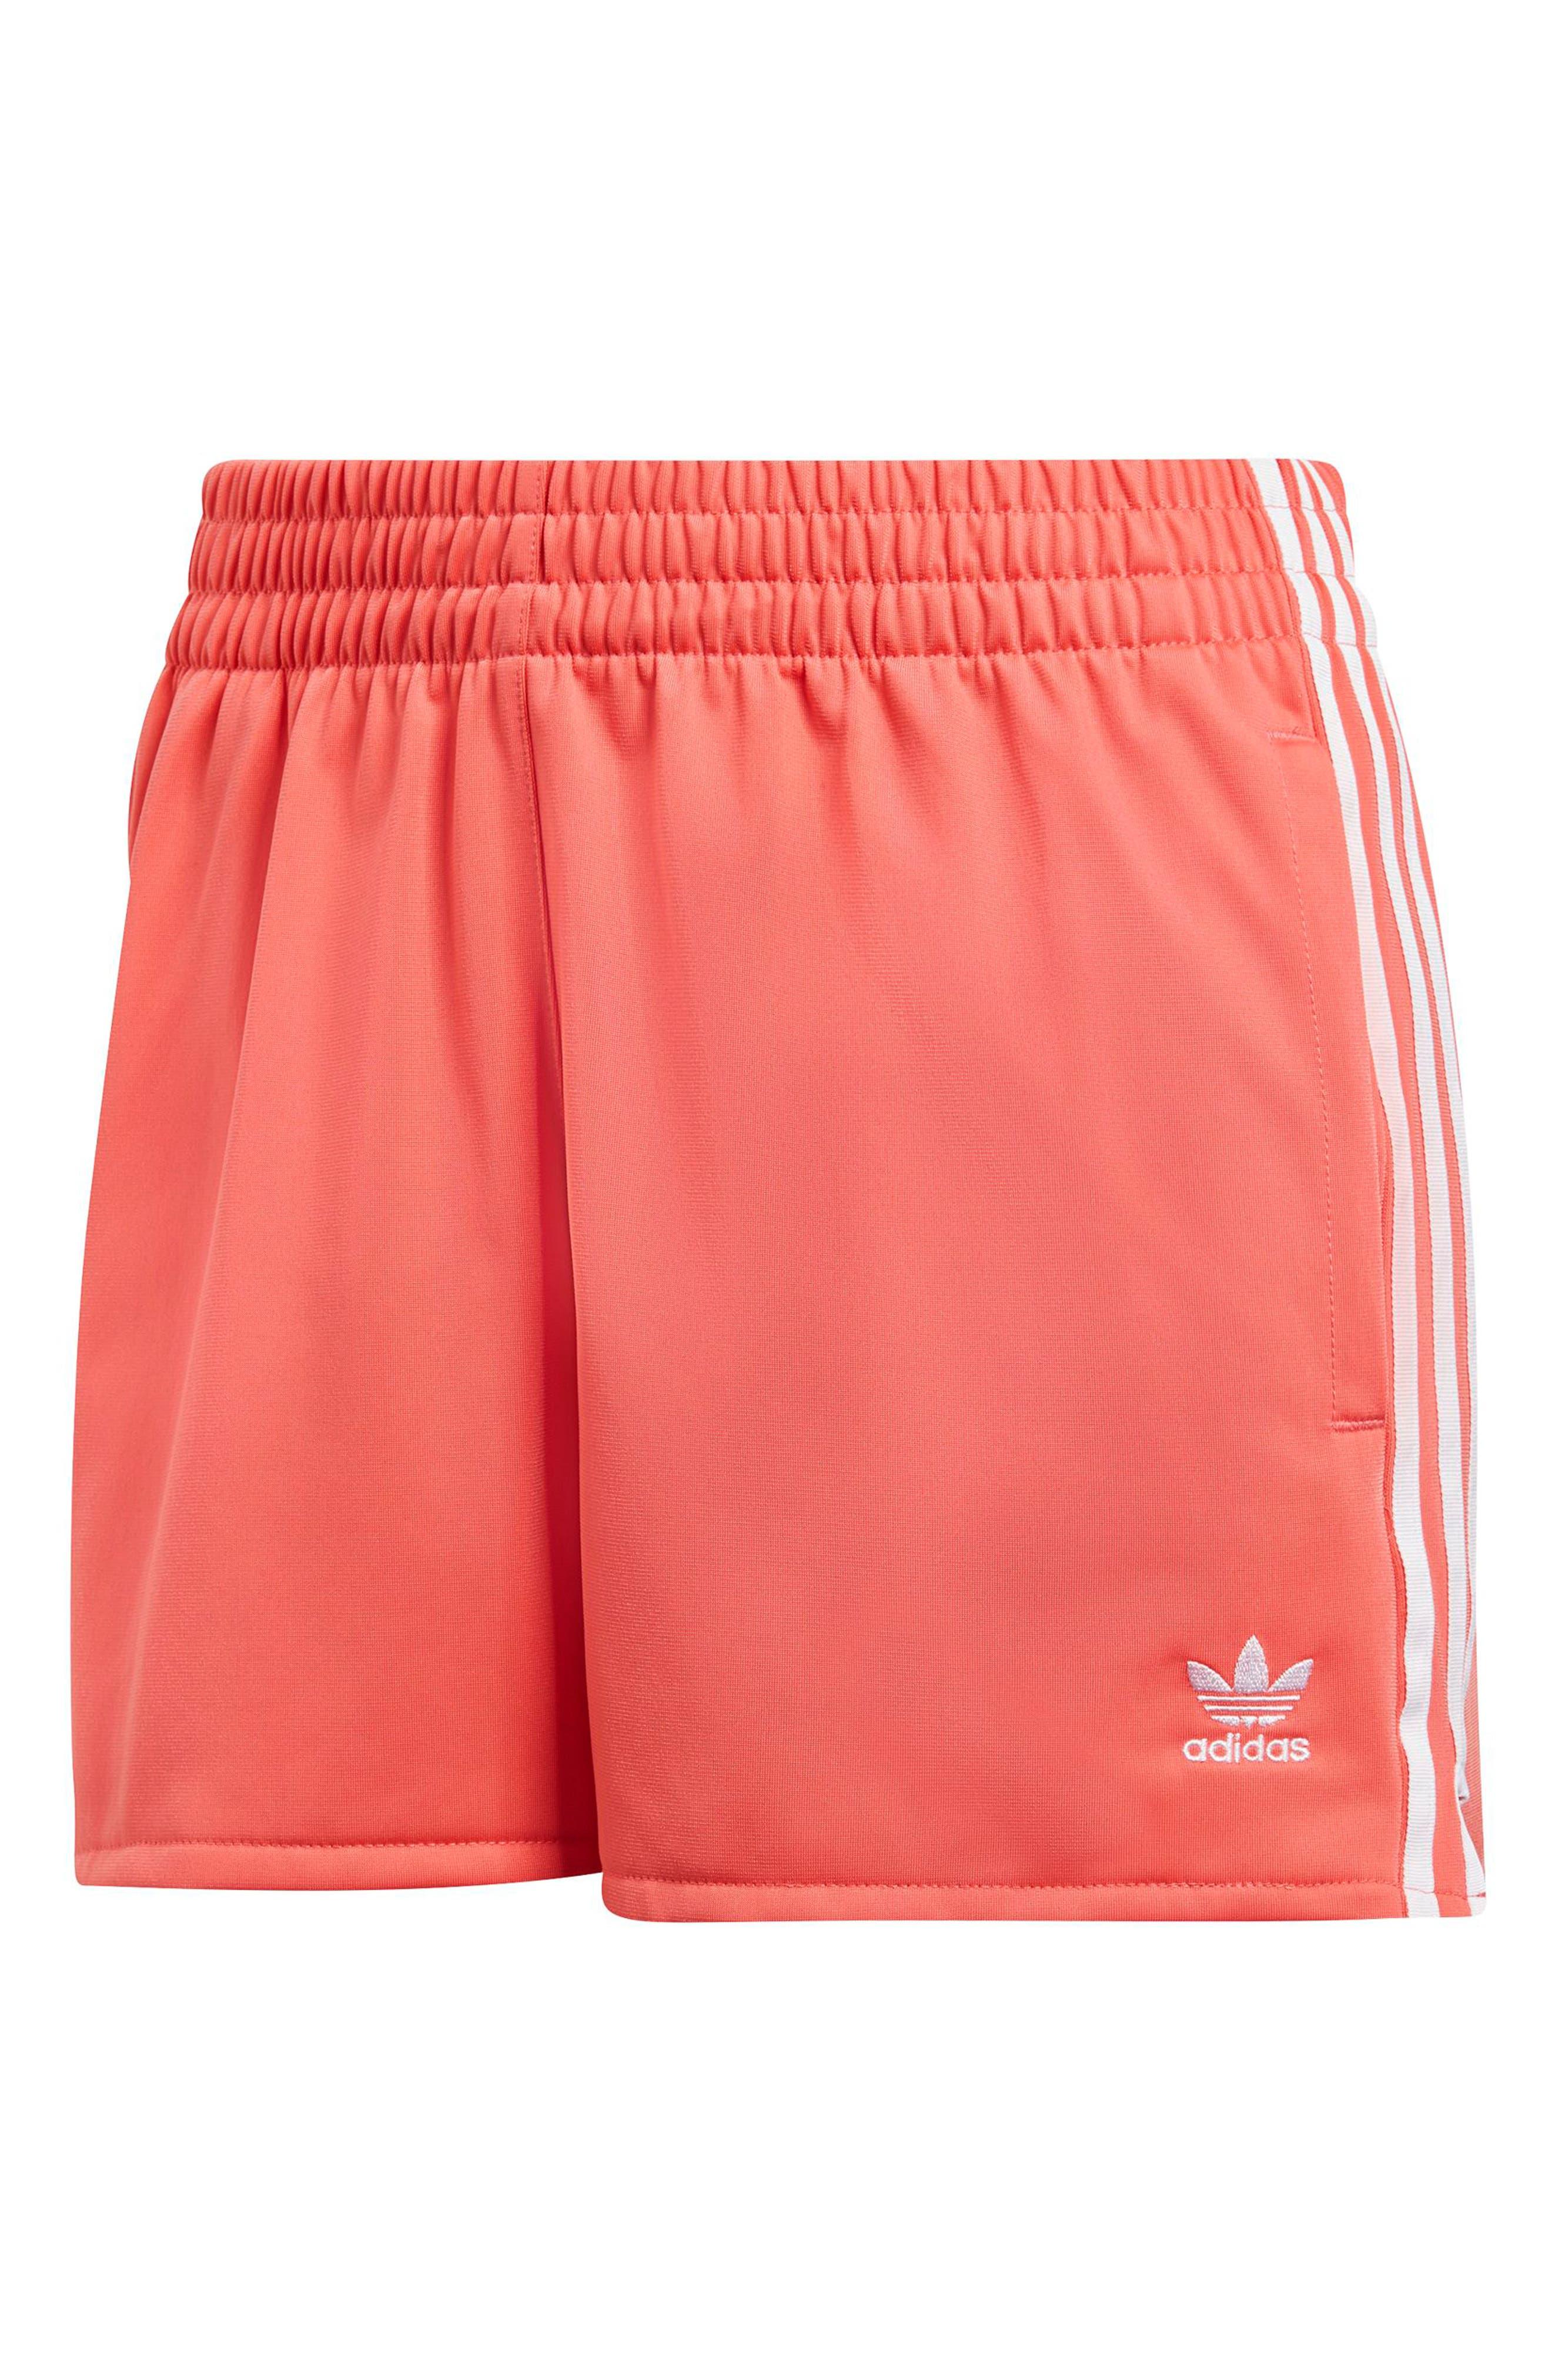 ADIDAS ORIGINALS,                             3-Stripes Shorts,                             Alternate thumbnail 7, color,                             600